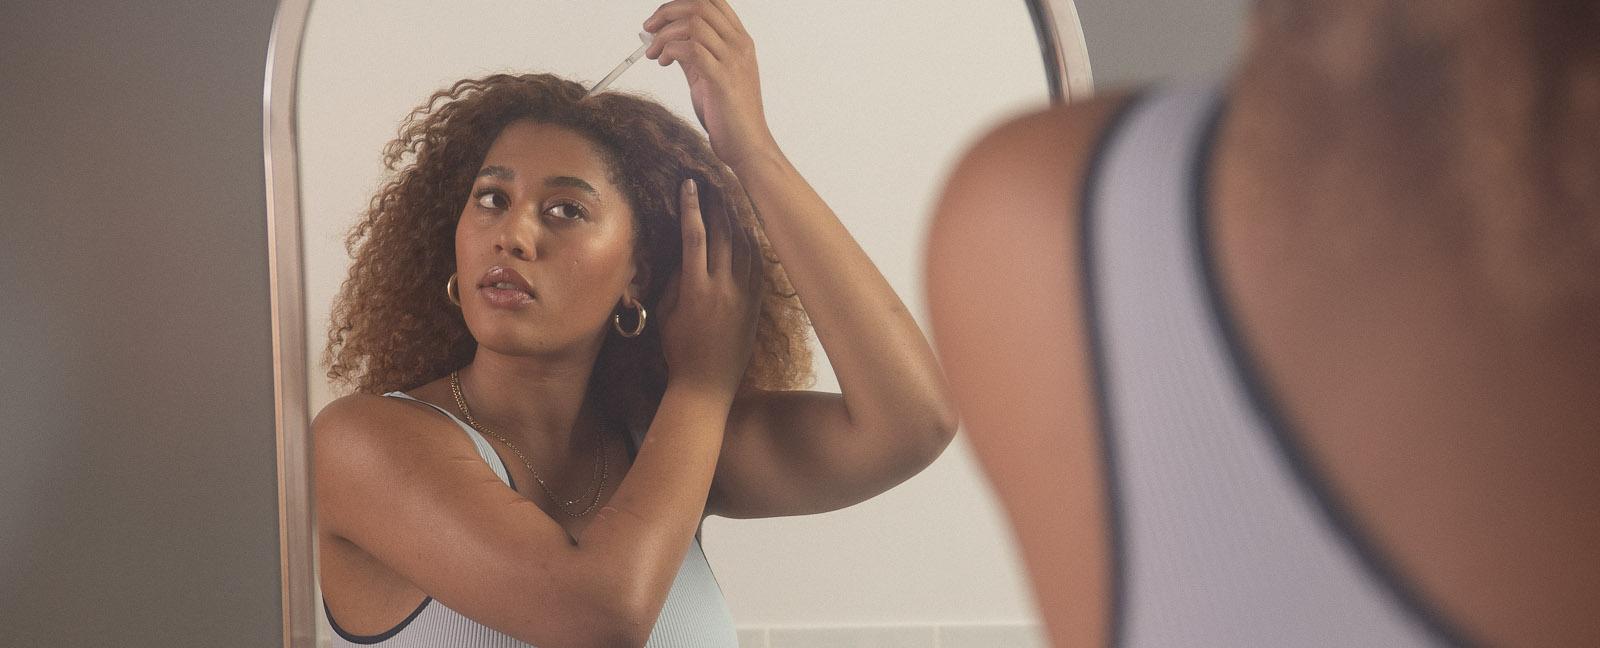 Postpartum Hair Loss: Don't Panic!